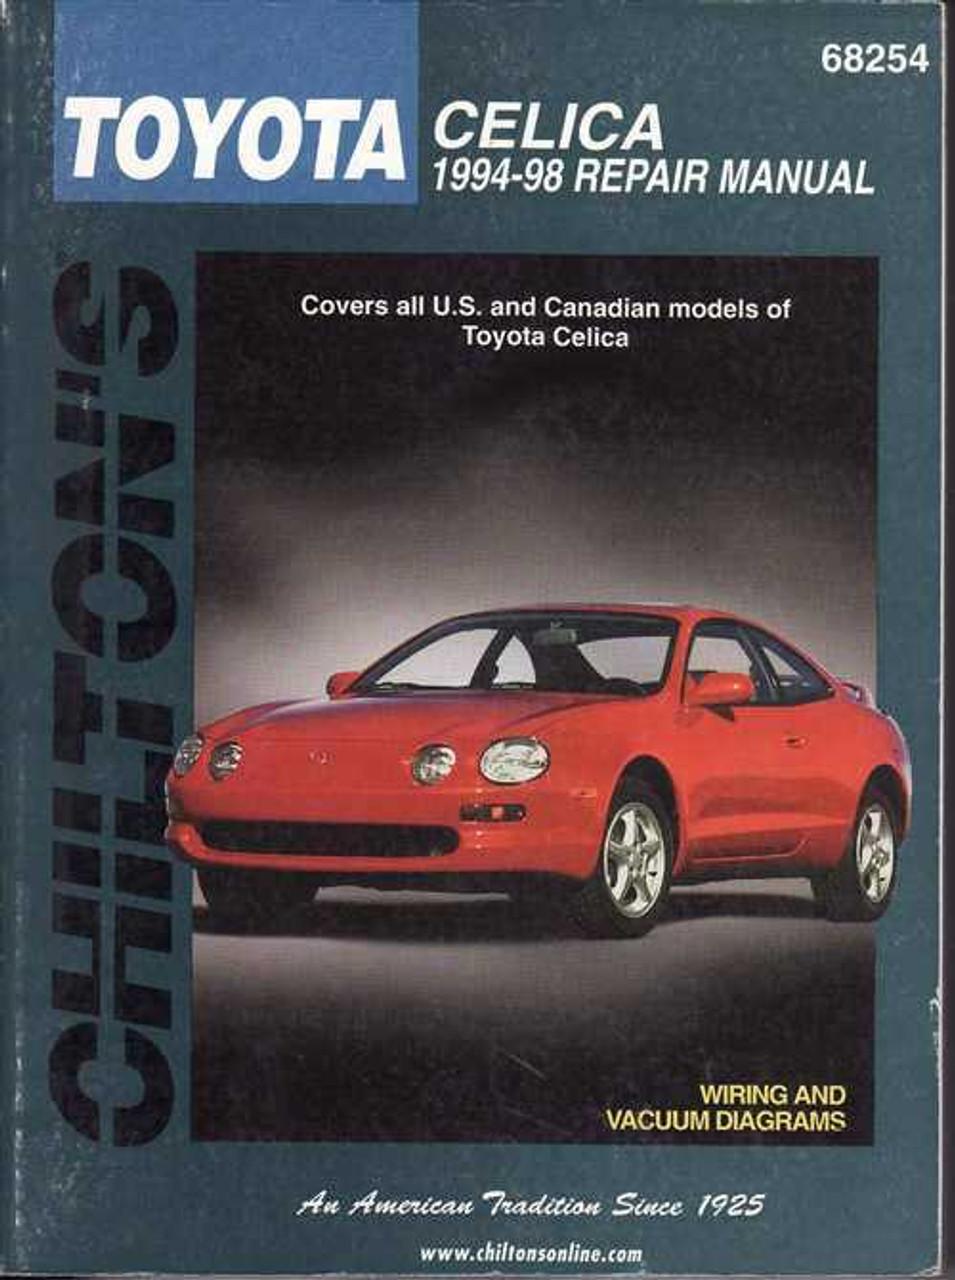 Toyota Celica 1994 1998 Workshop Manual